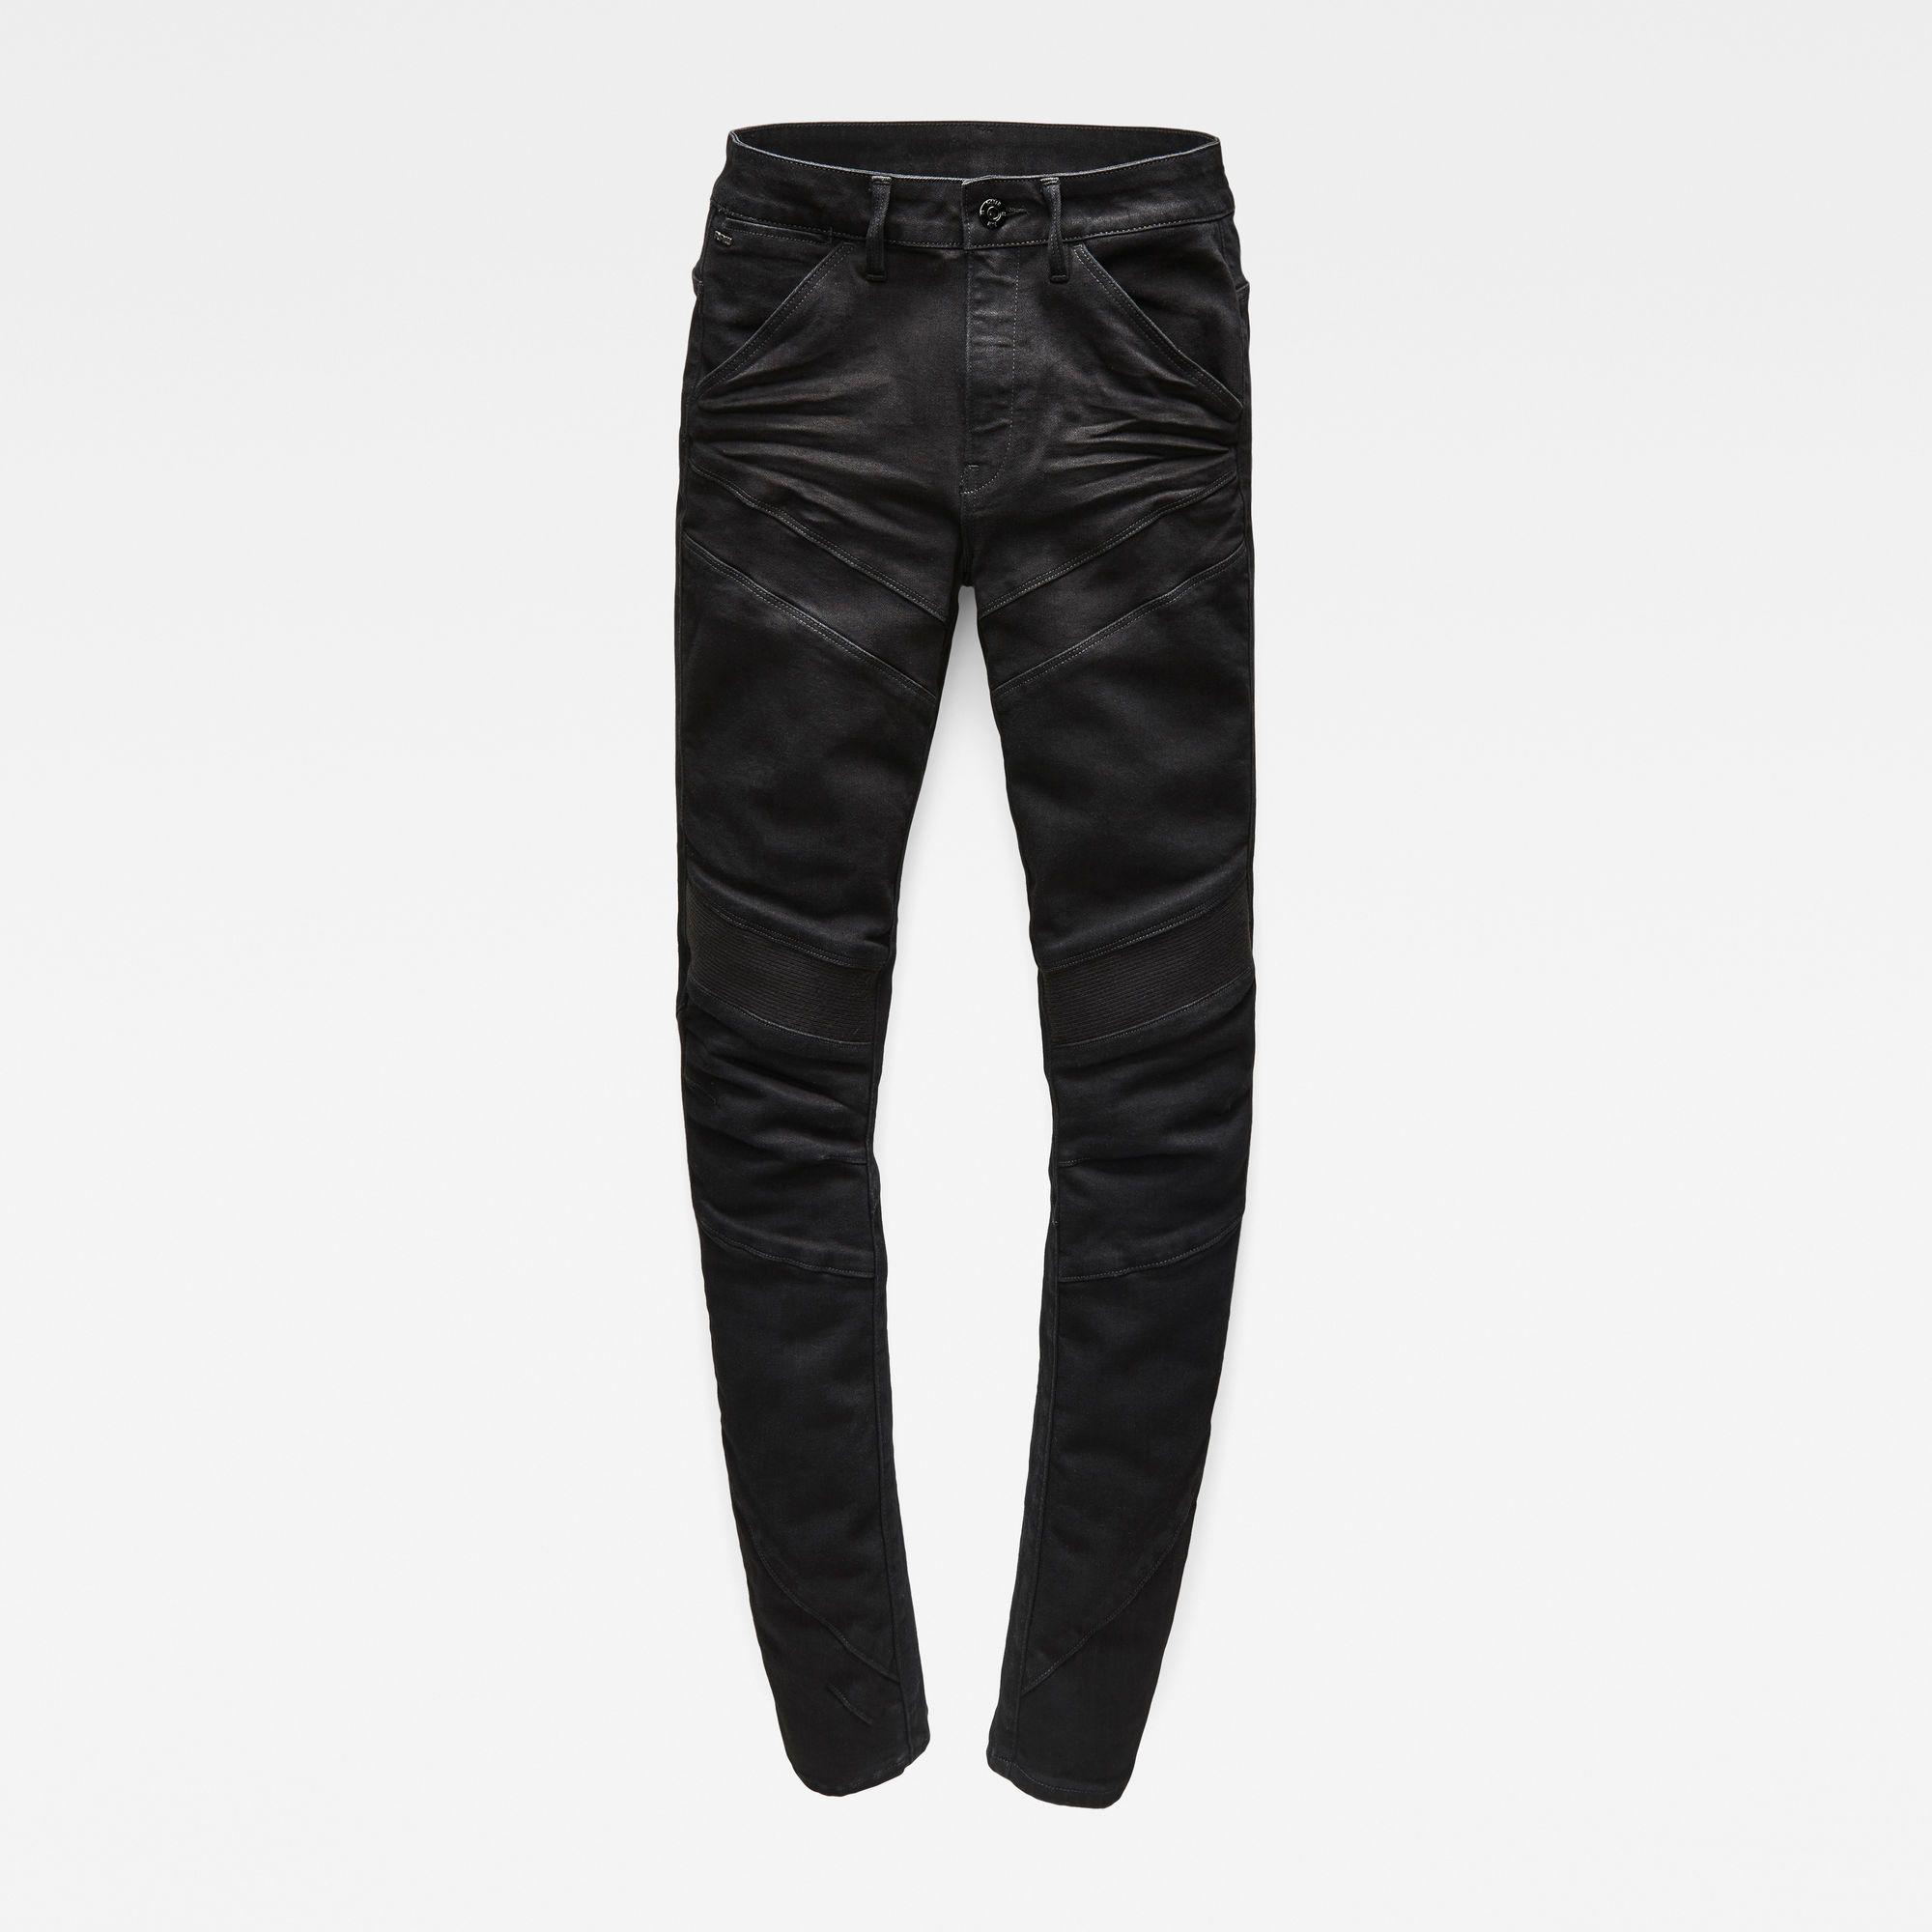 G-Star RAW Motac-X D-3D High Skinny Ankle Jeans